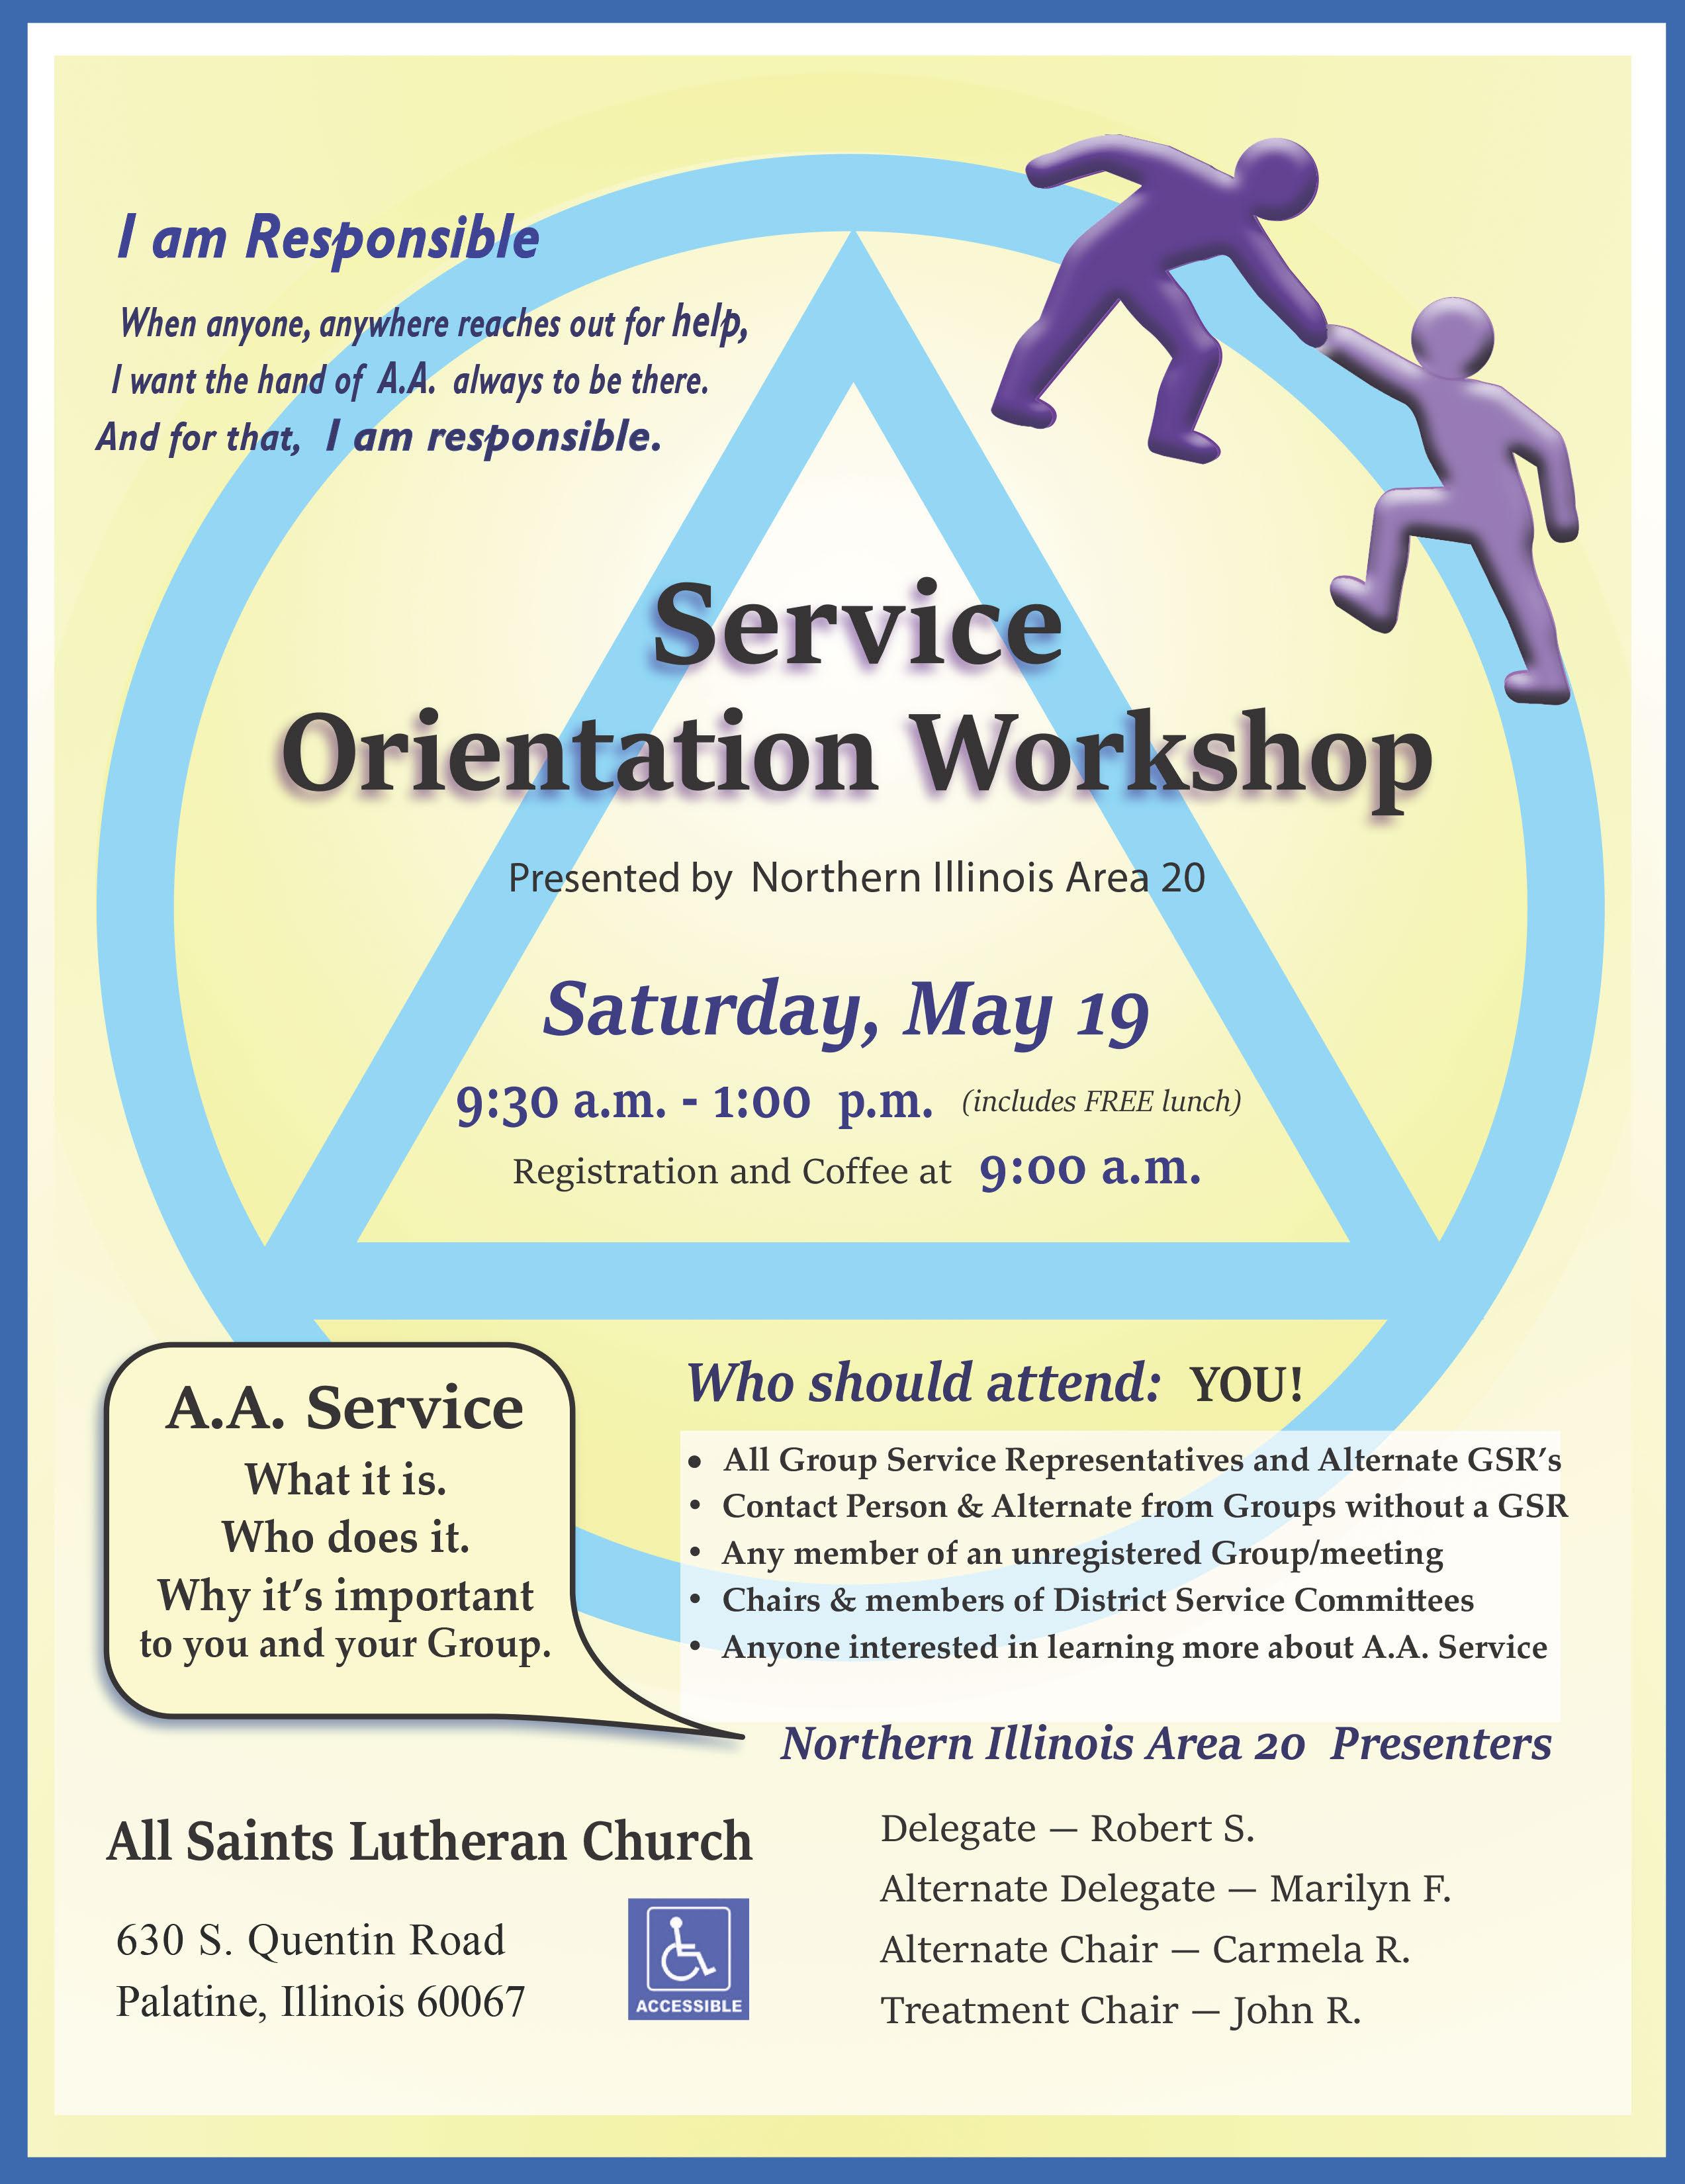 NIA Service Orientation Workshop 1